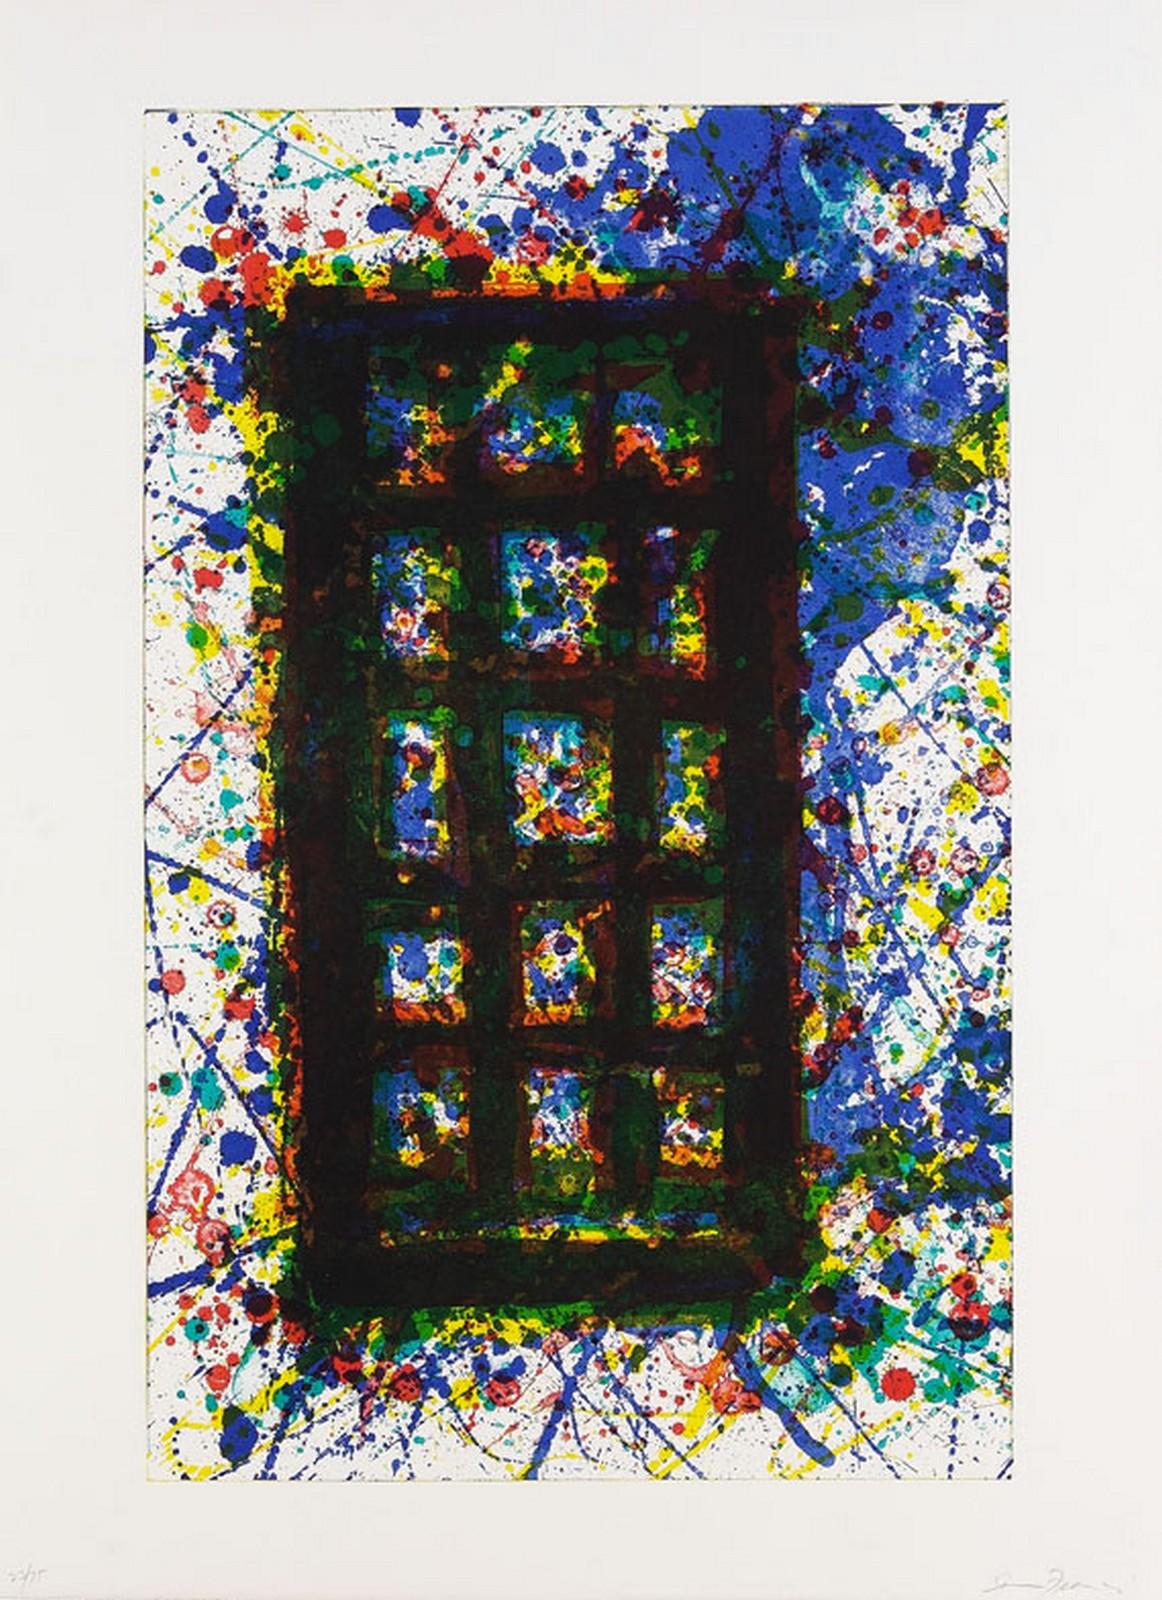 1977, lithograph, 56 x 75 cm